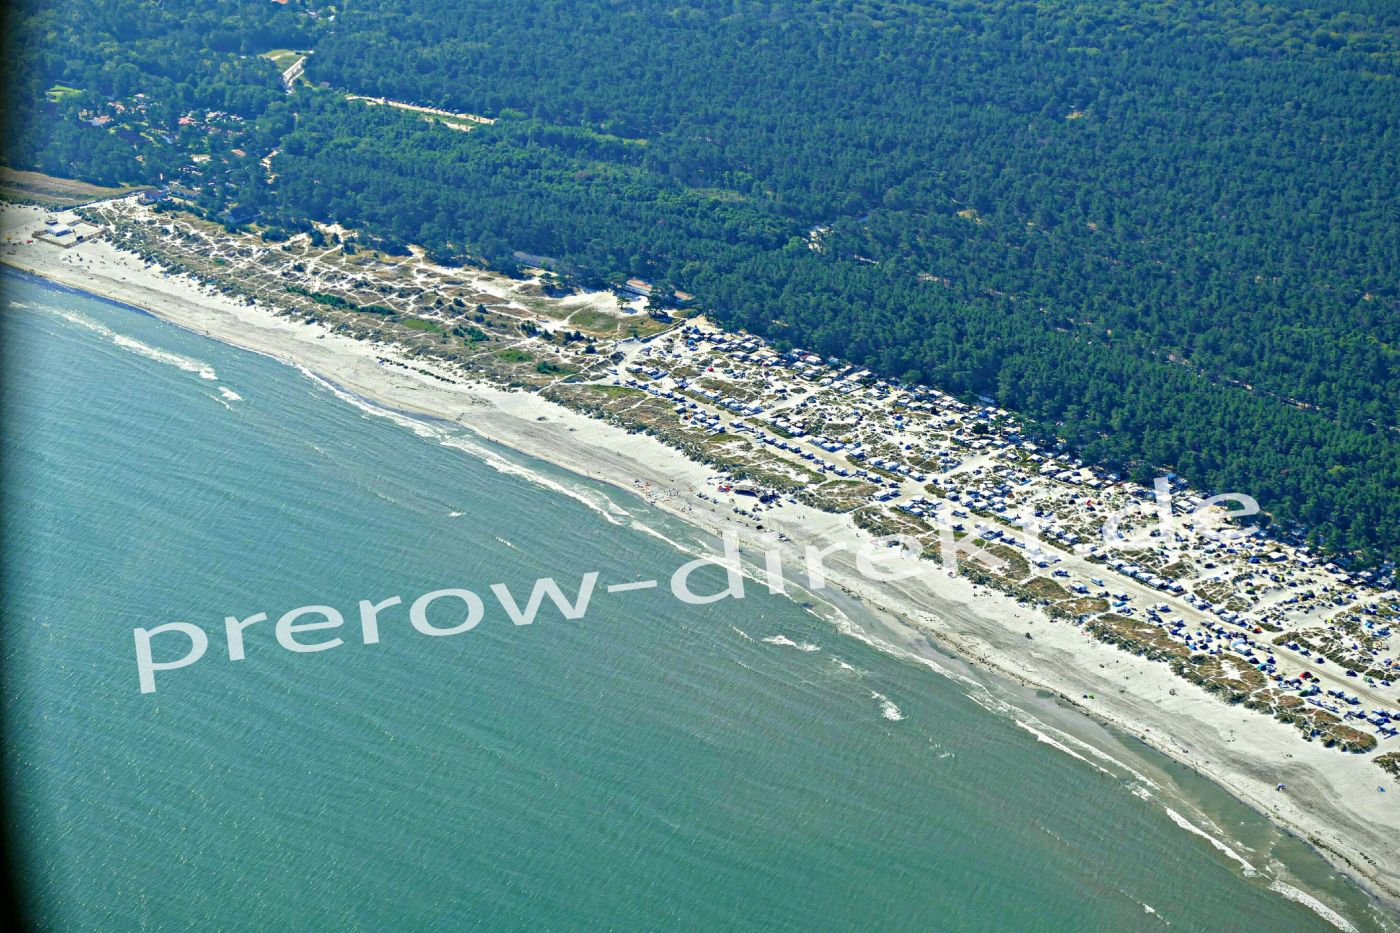 Prerow Campingplatz und Strand